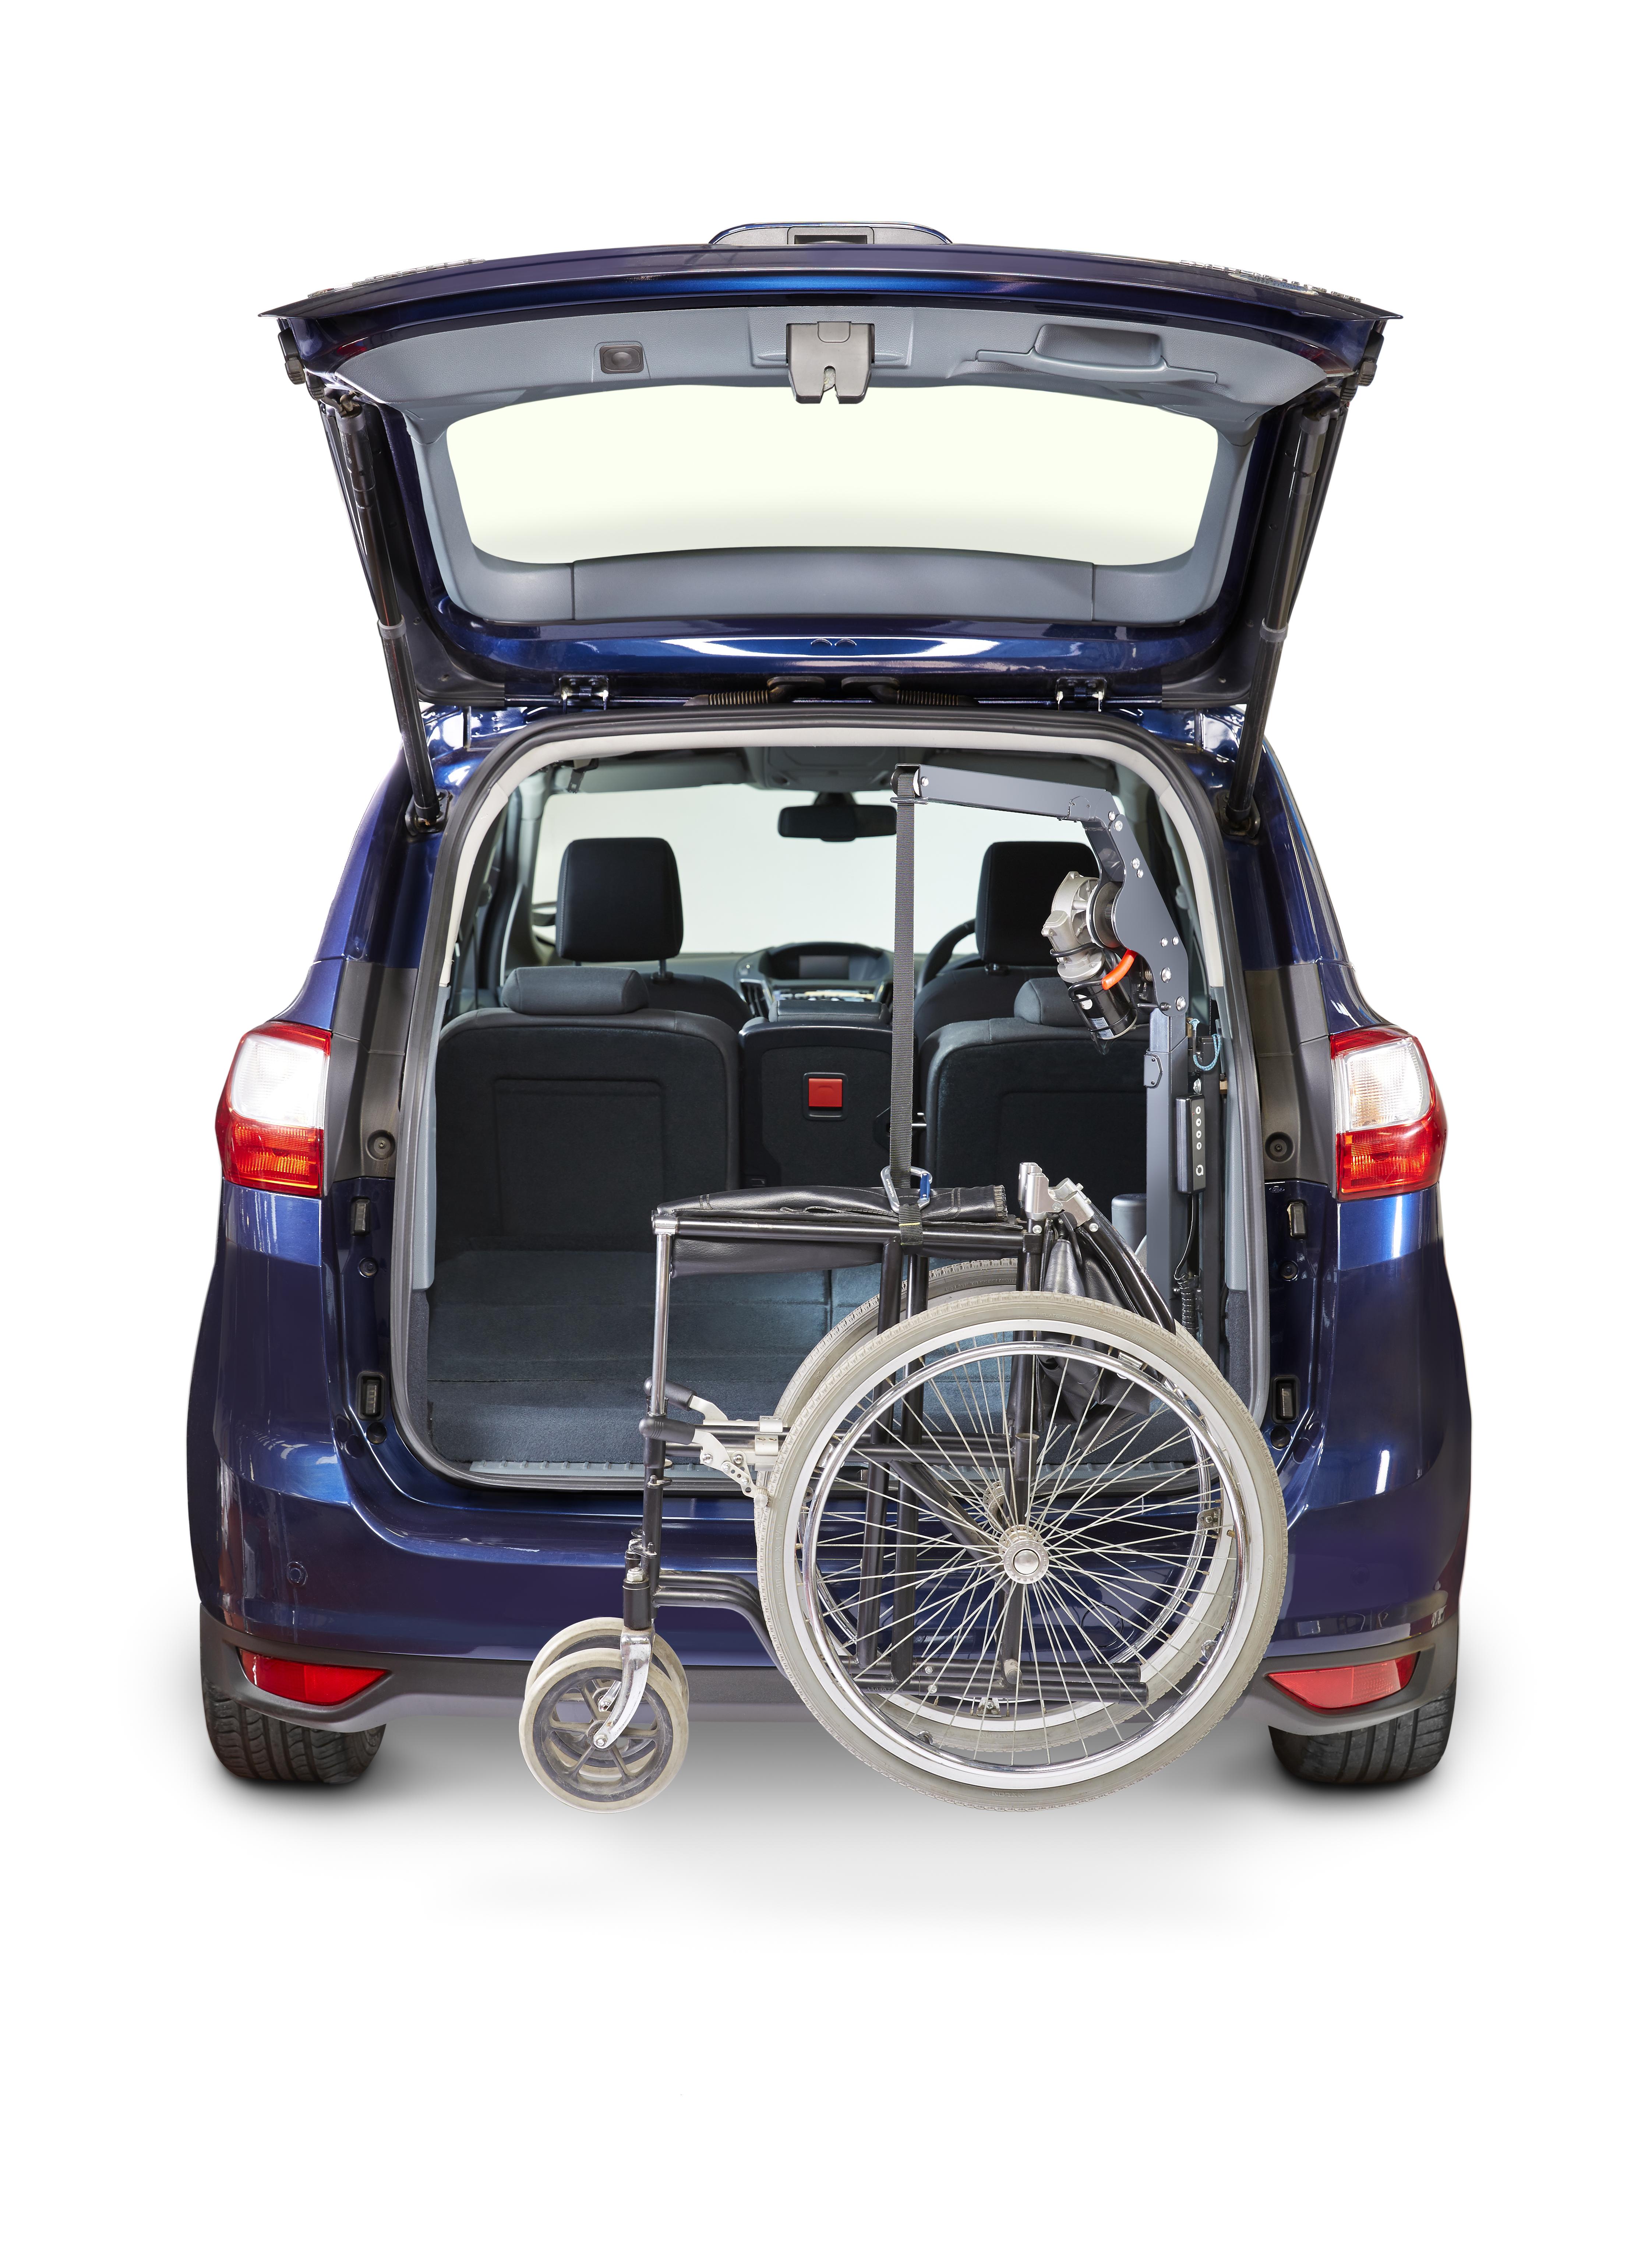 LM Range Hoist-sheffield mobility